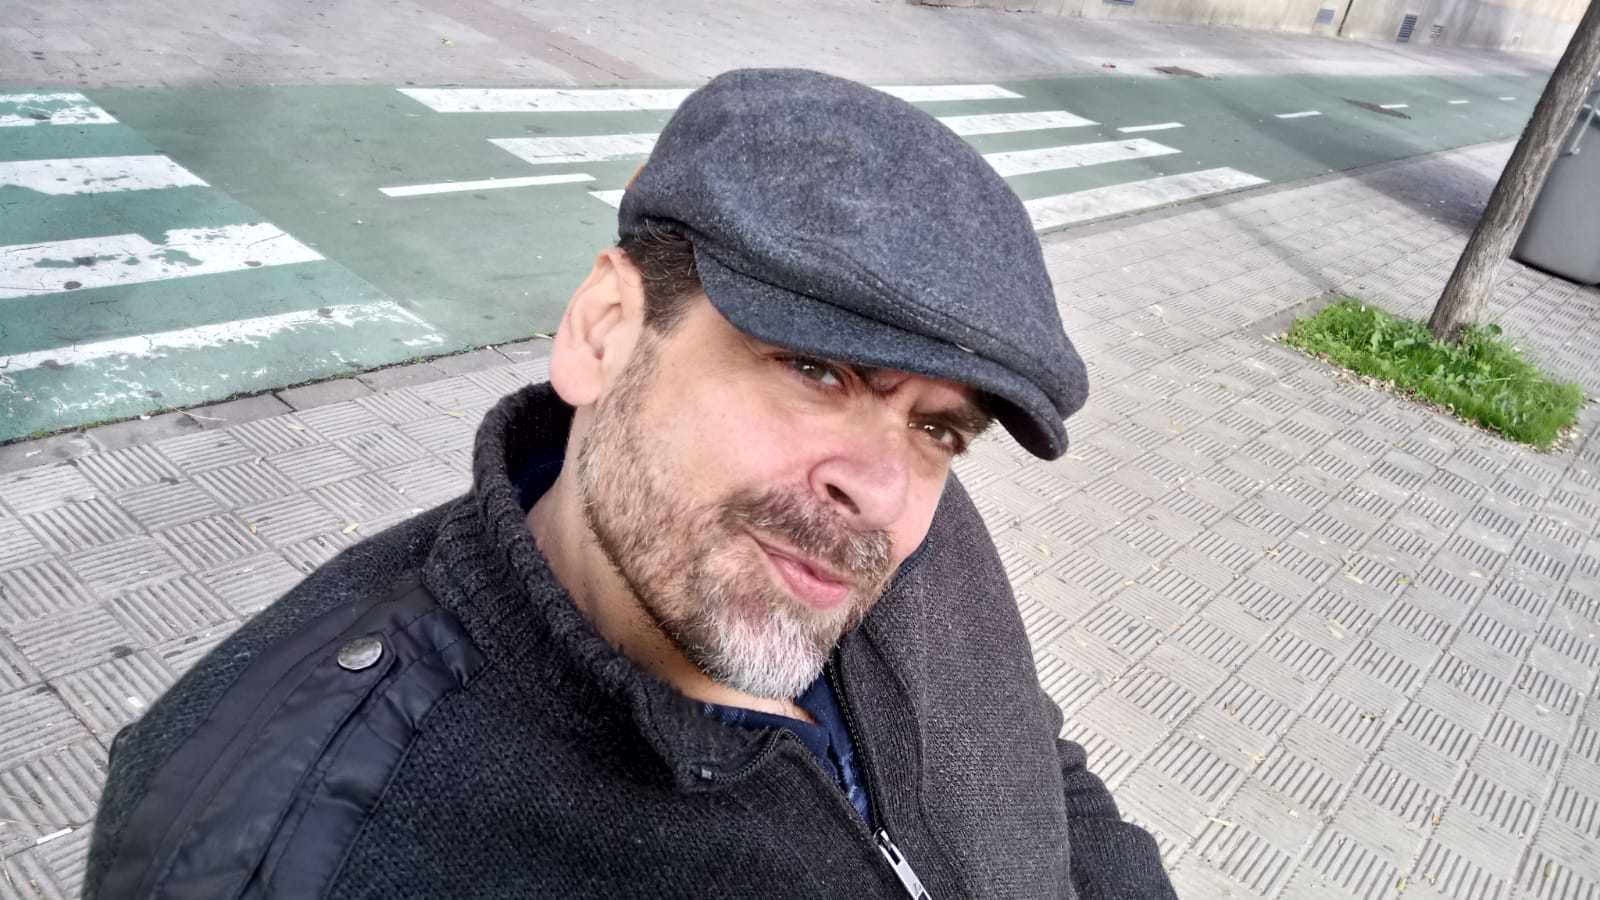 fotografía de Juan Ramon Biedma